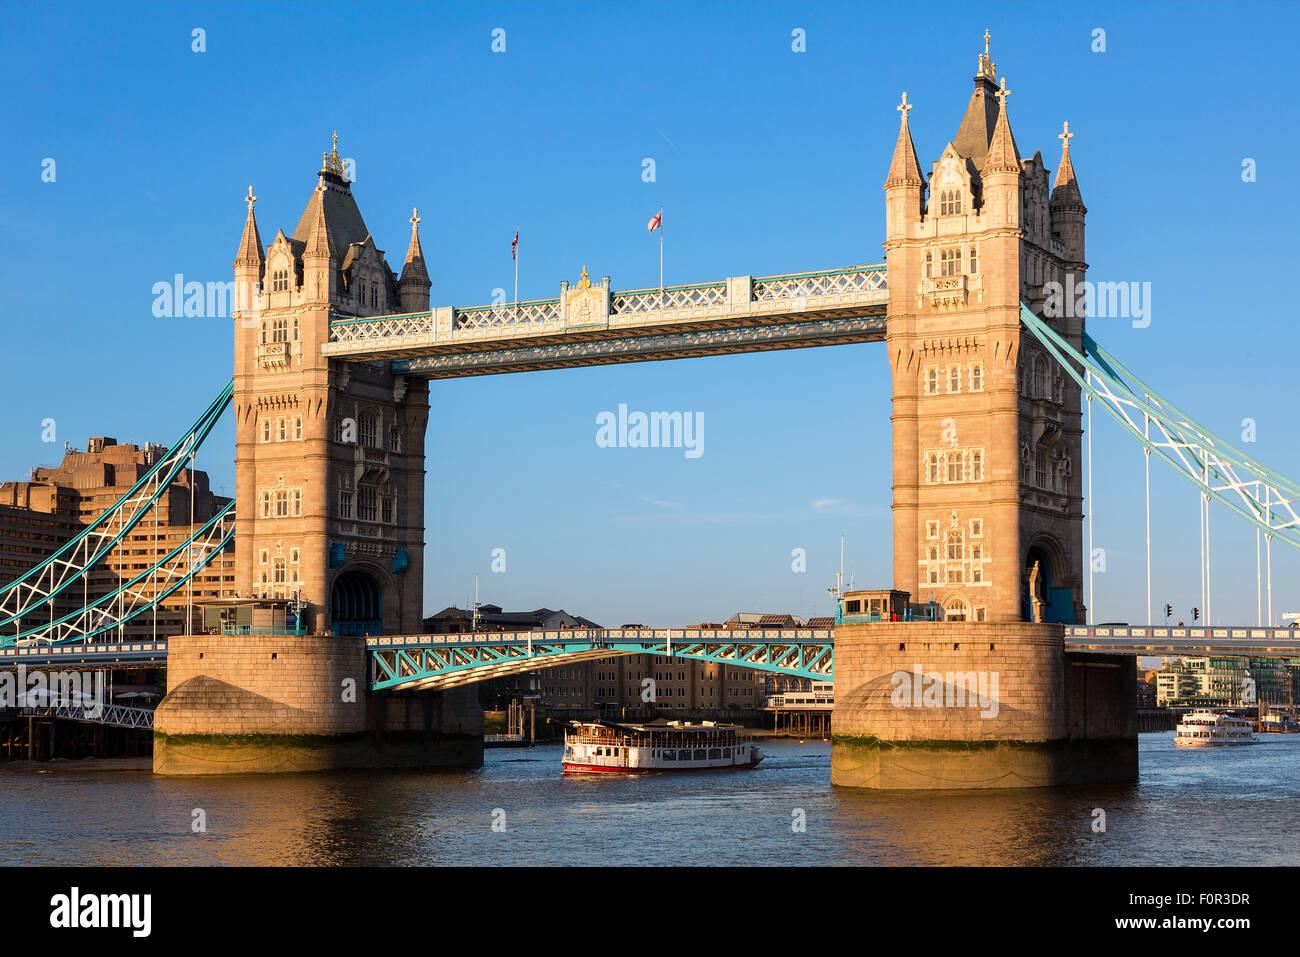 London, Tower bridge at sunset - Stock Image